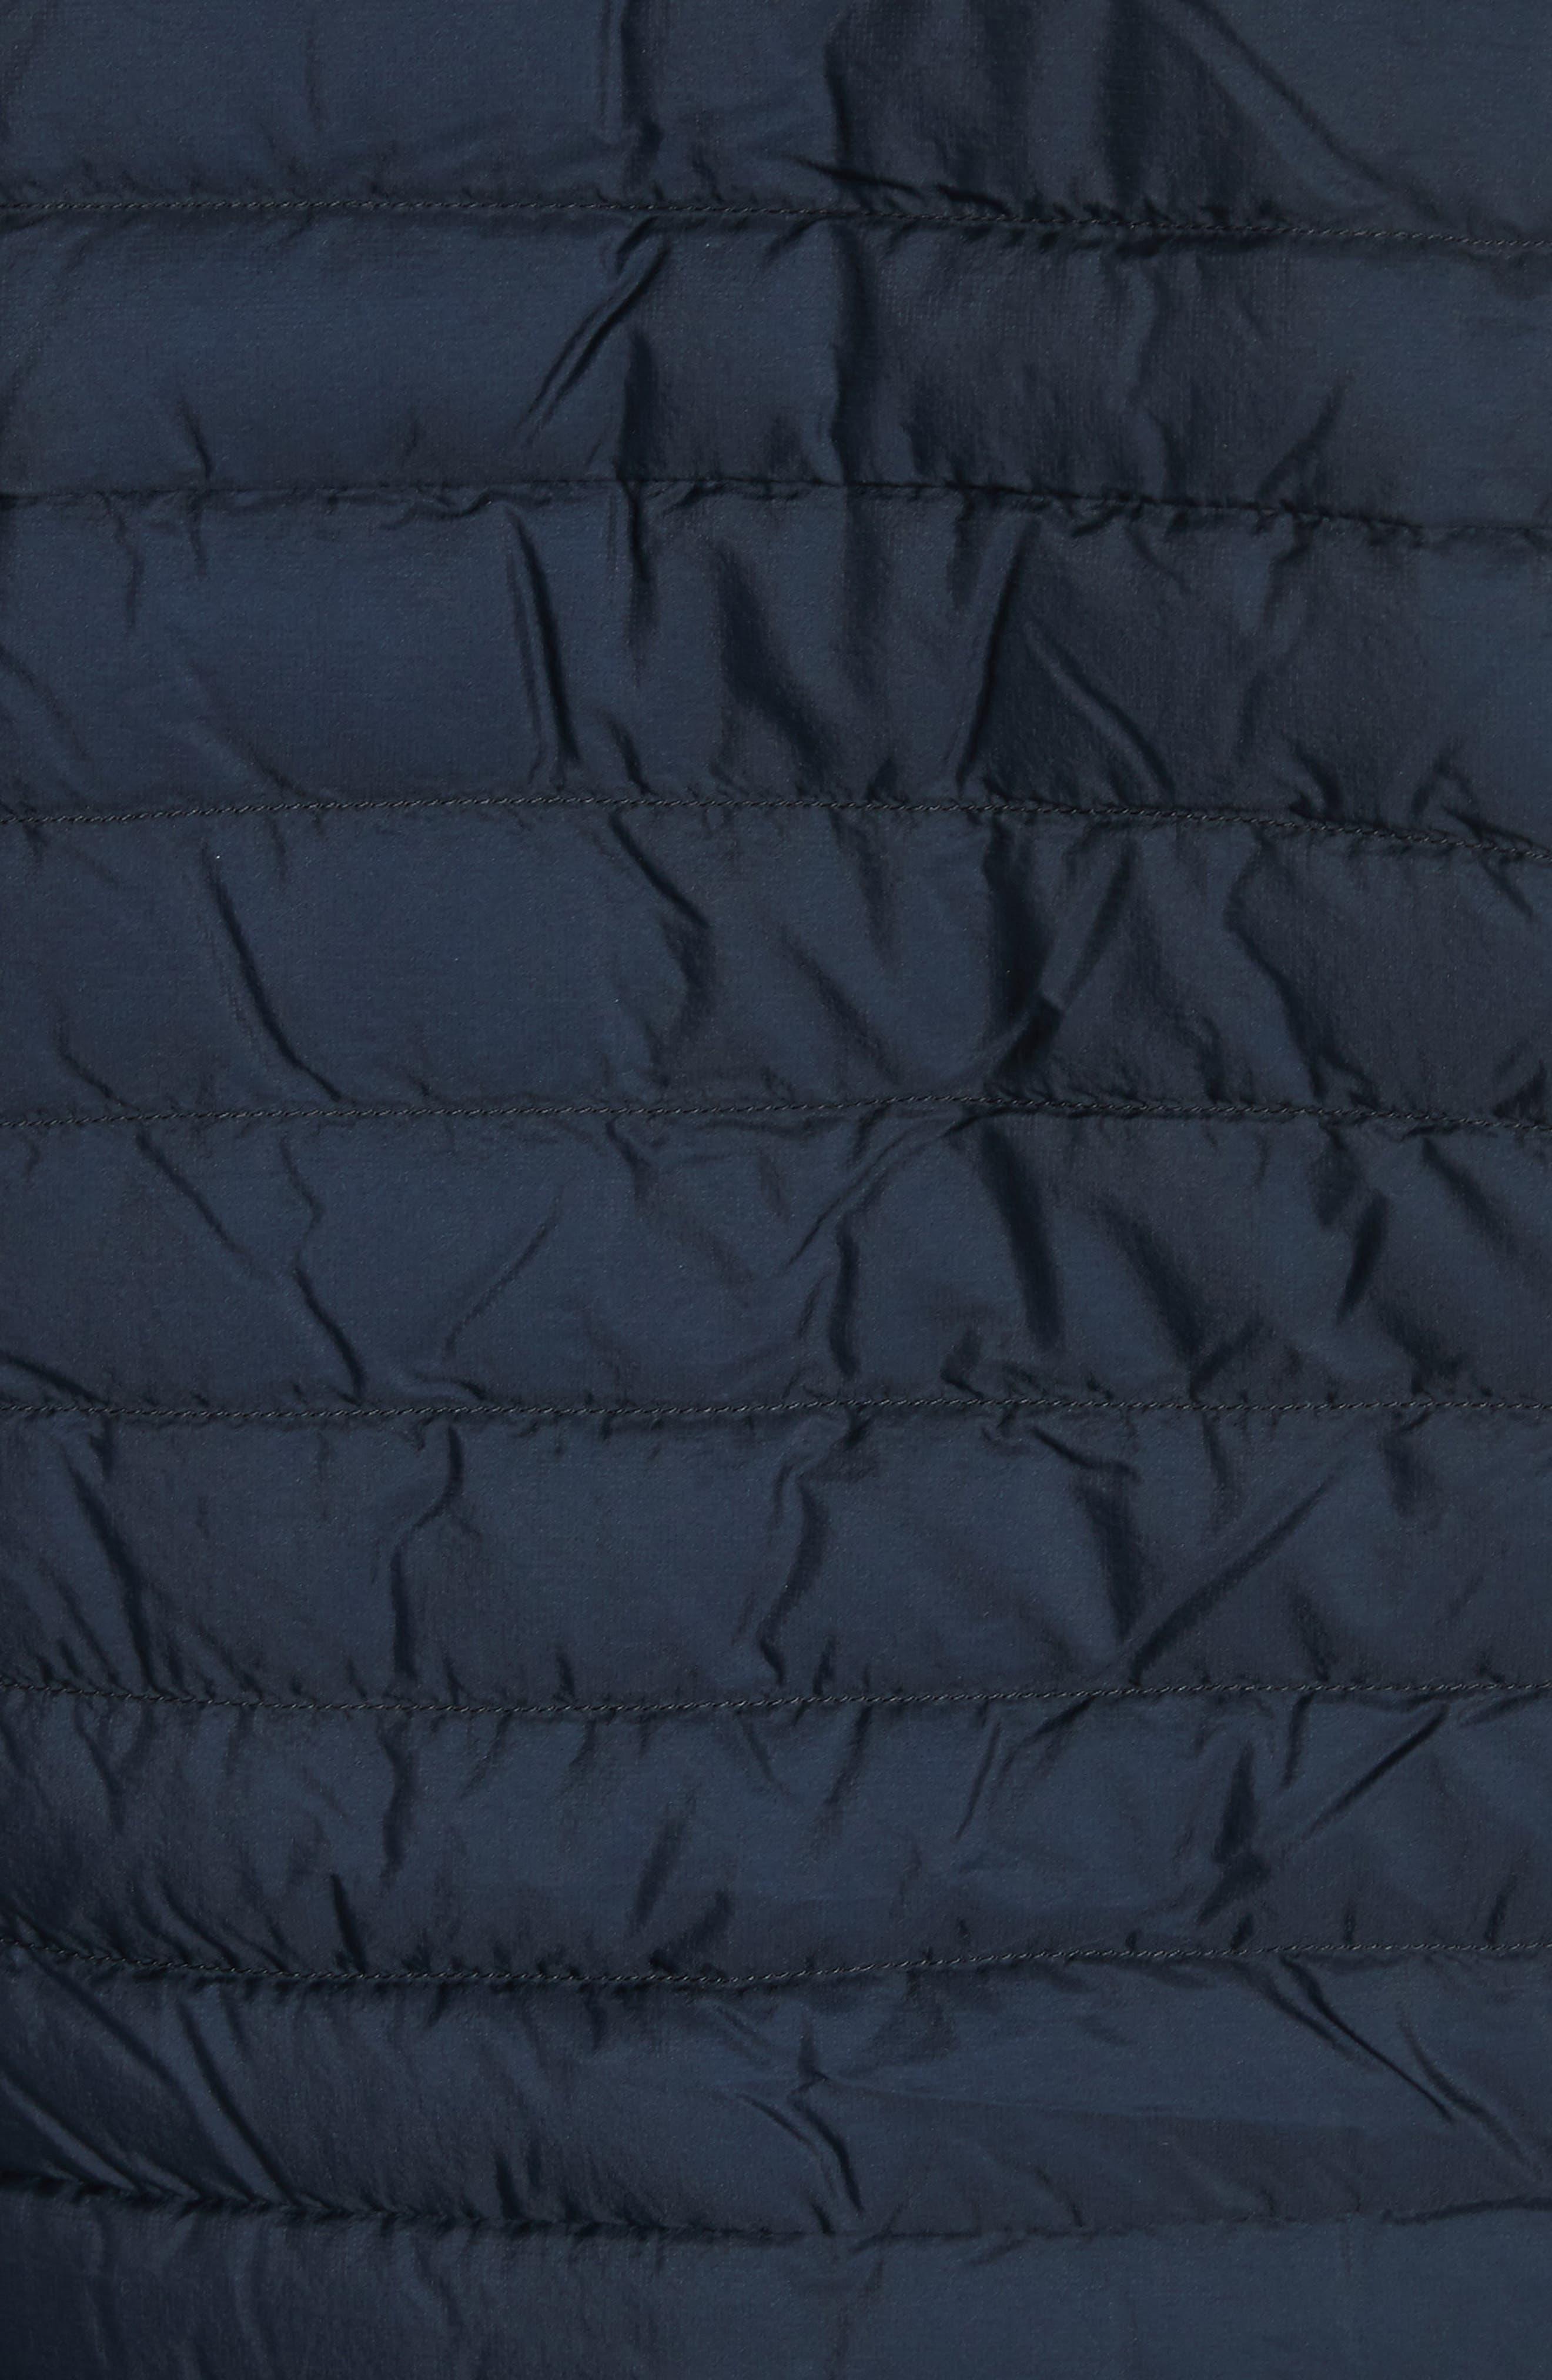 Conduit Lightweight Down Vest,                             Alternate thumbnail 8, color,                             DARK NAVY